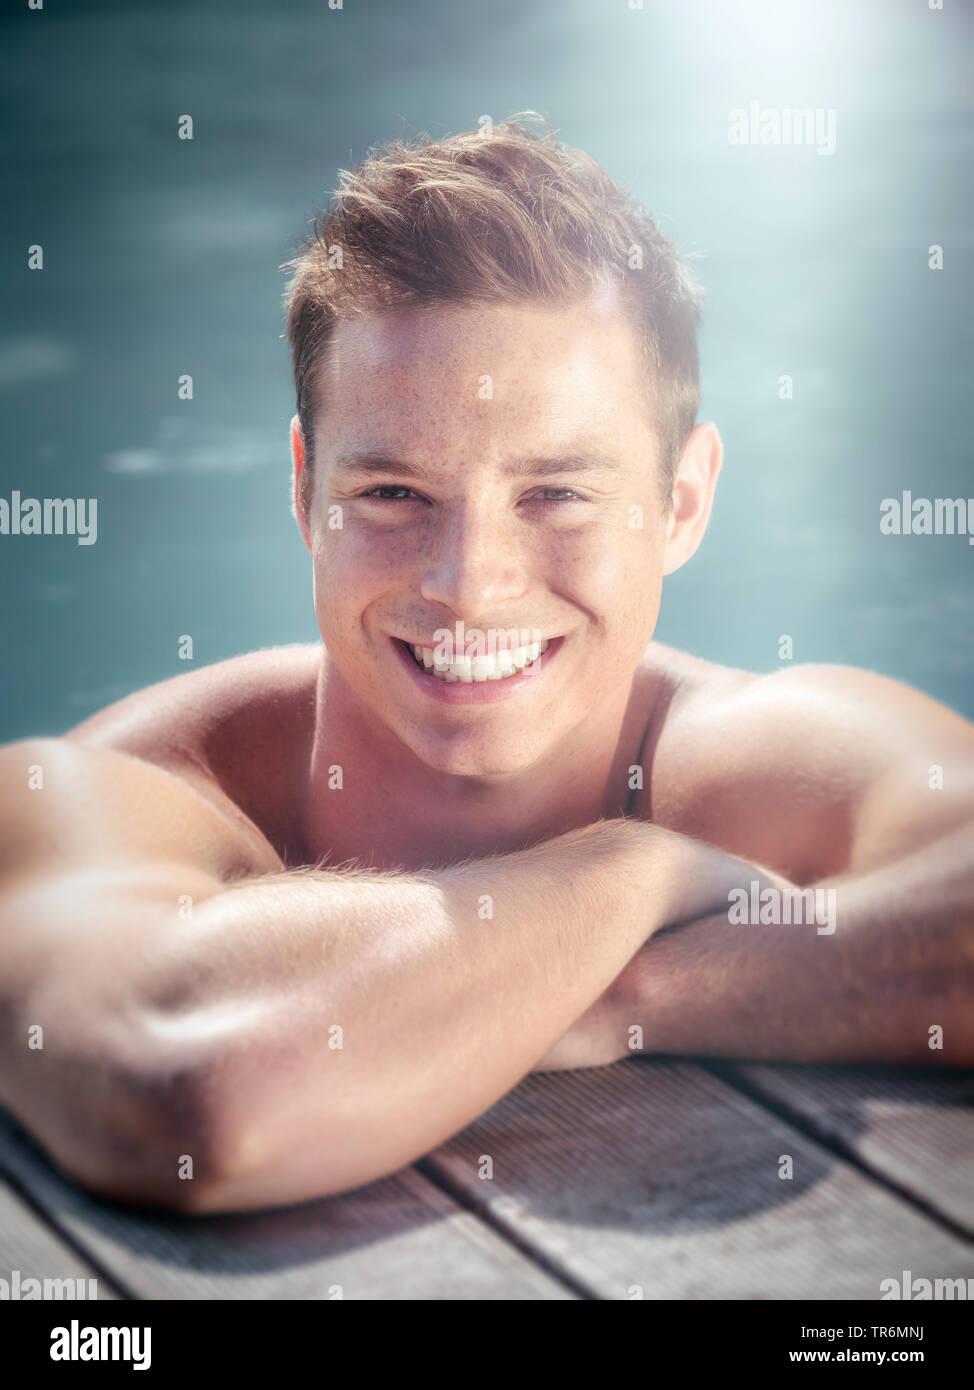 junger Mann am Rand eines Schwimmbeckens, Deutschland | young man in a swimming pool, Germany | BLWS487225.jpg [ (c) blickwinkel/McPHOTO/M. Gann Tel. - Stock Image